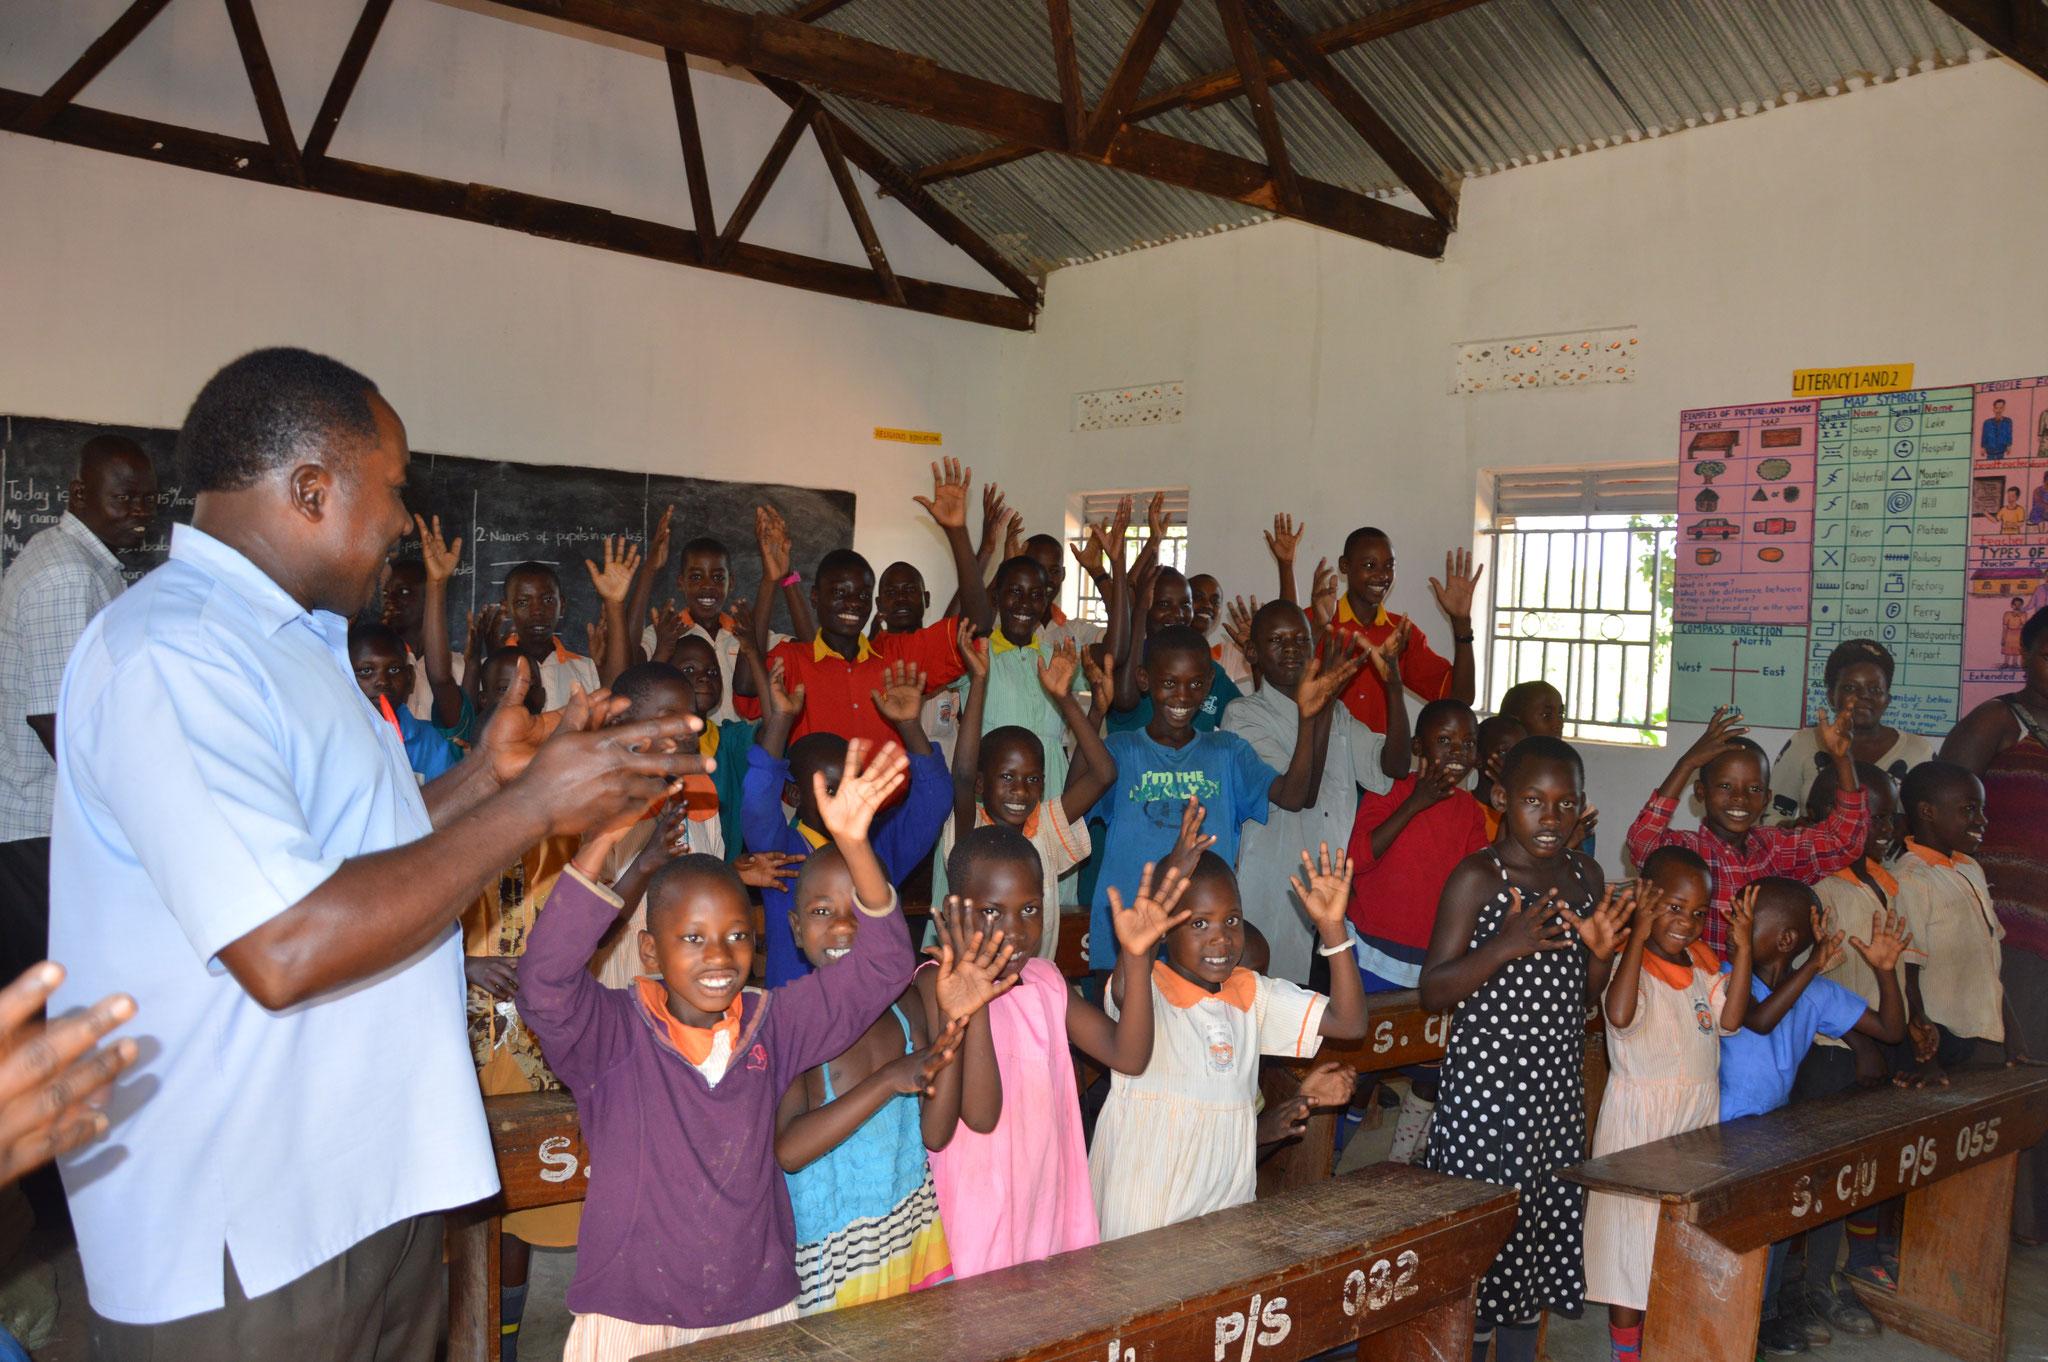 Die Gehörlosen Schüler der School of Uganda in Sembabule